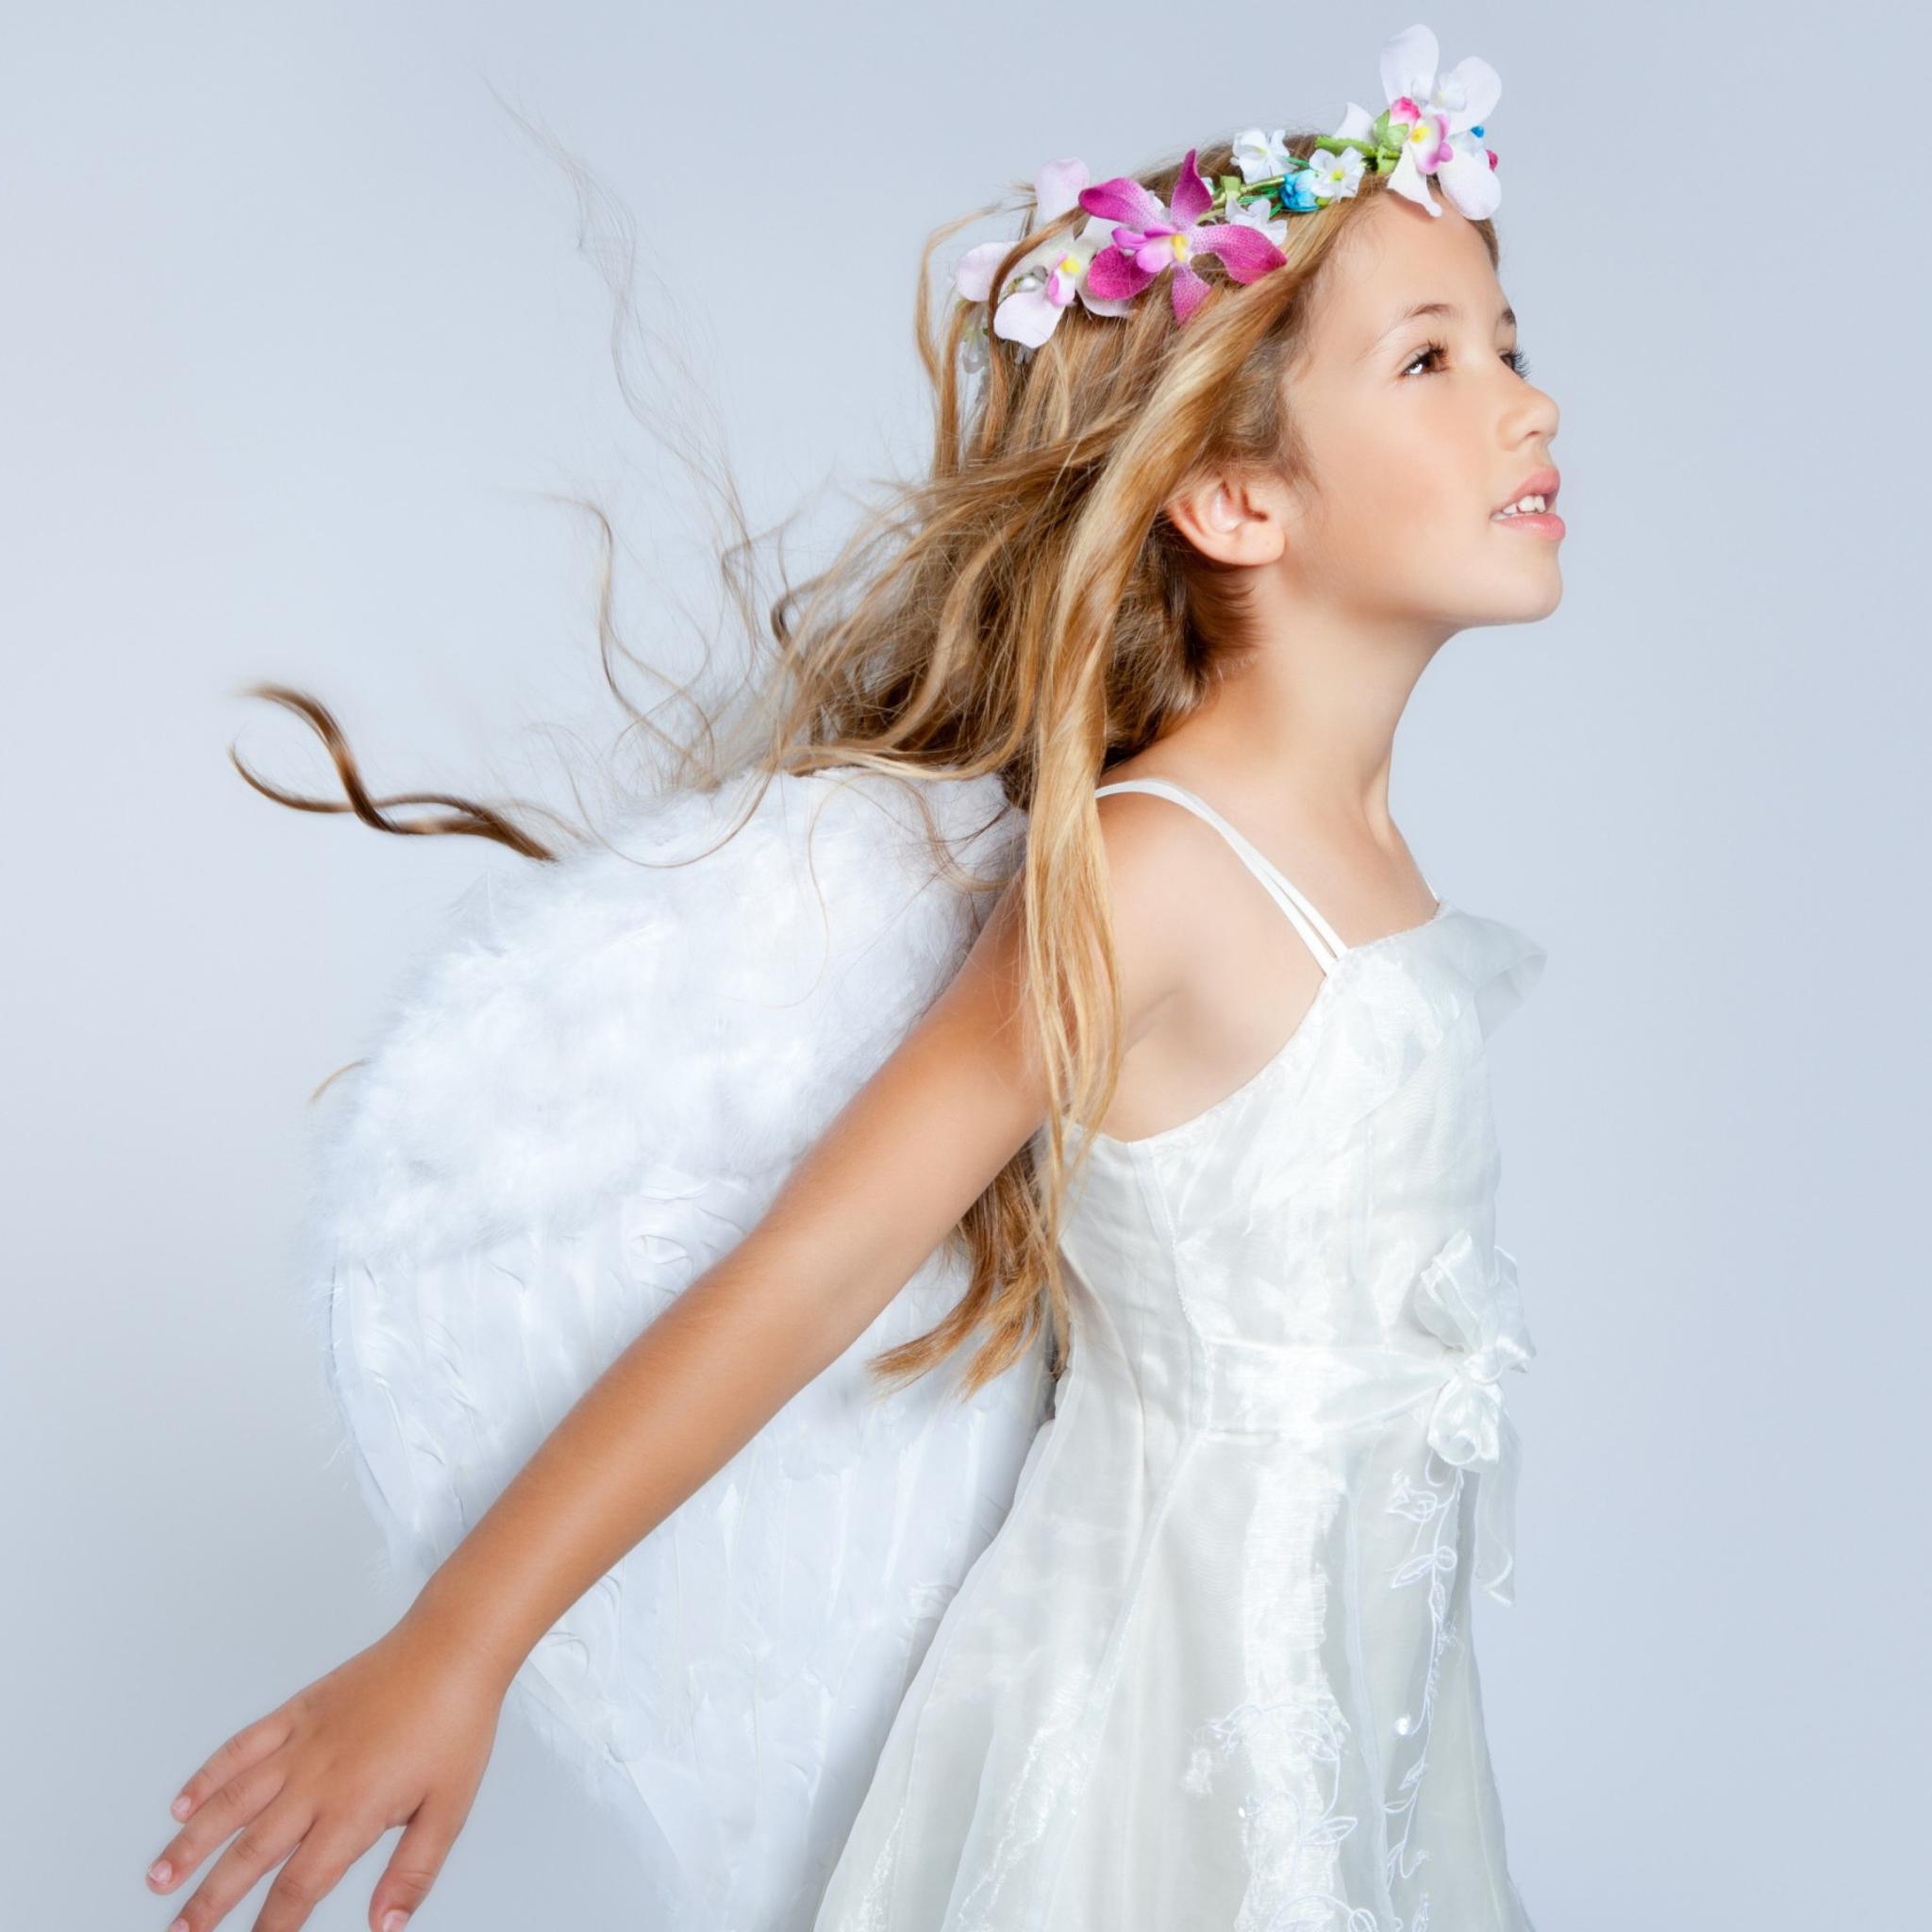 Cute little angel pictures A Little Angel Images, Stock Photos Vectors Shutterstock